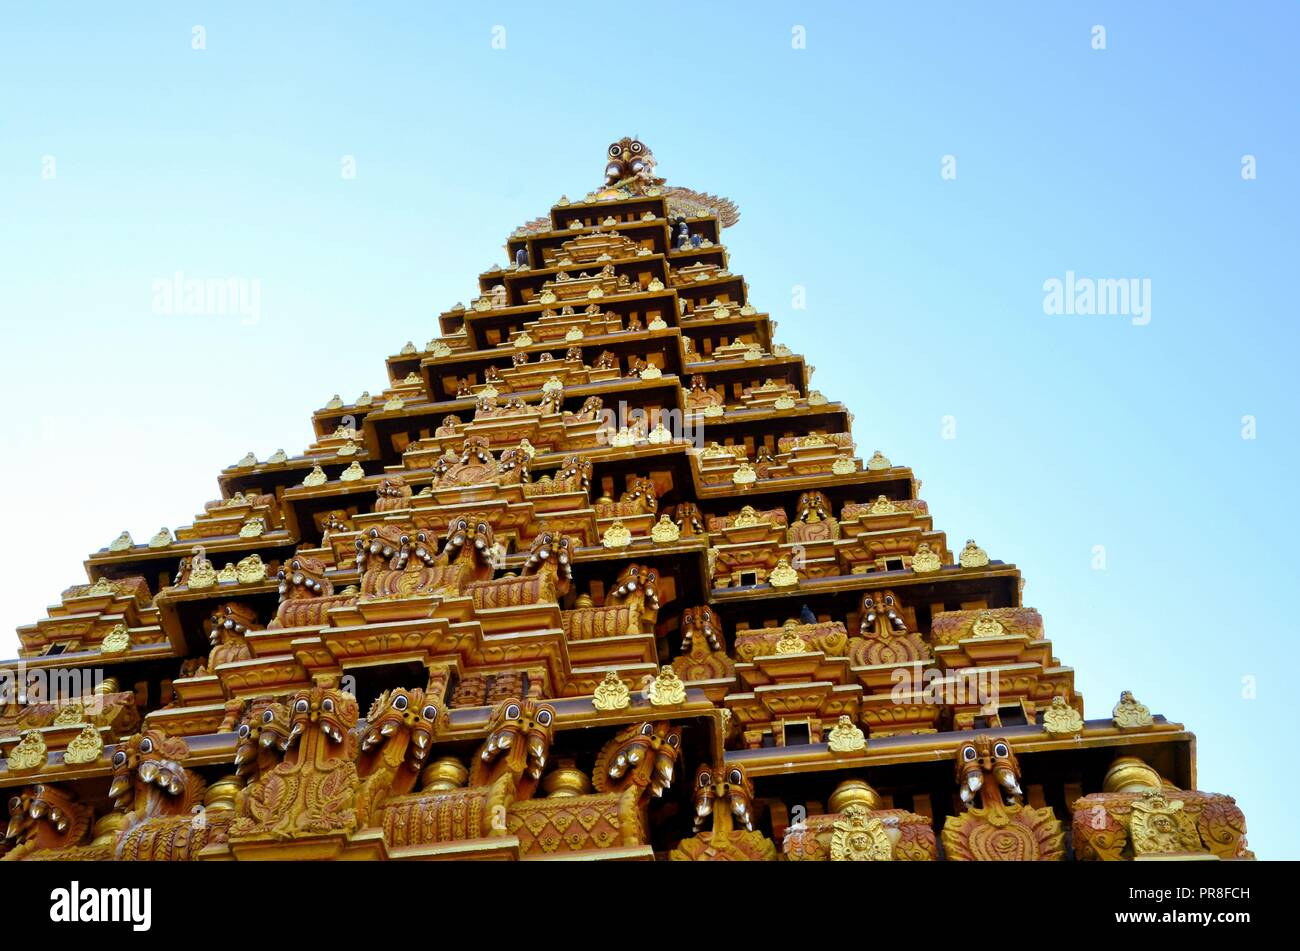 Ornate gopuram pagoda tower with sculpture gods at Nallur Kandaswamy Kovil  Hindu temple Jaffna Sri Lanka - Stock Image